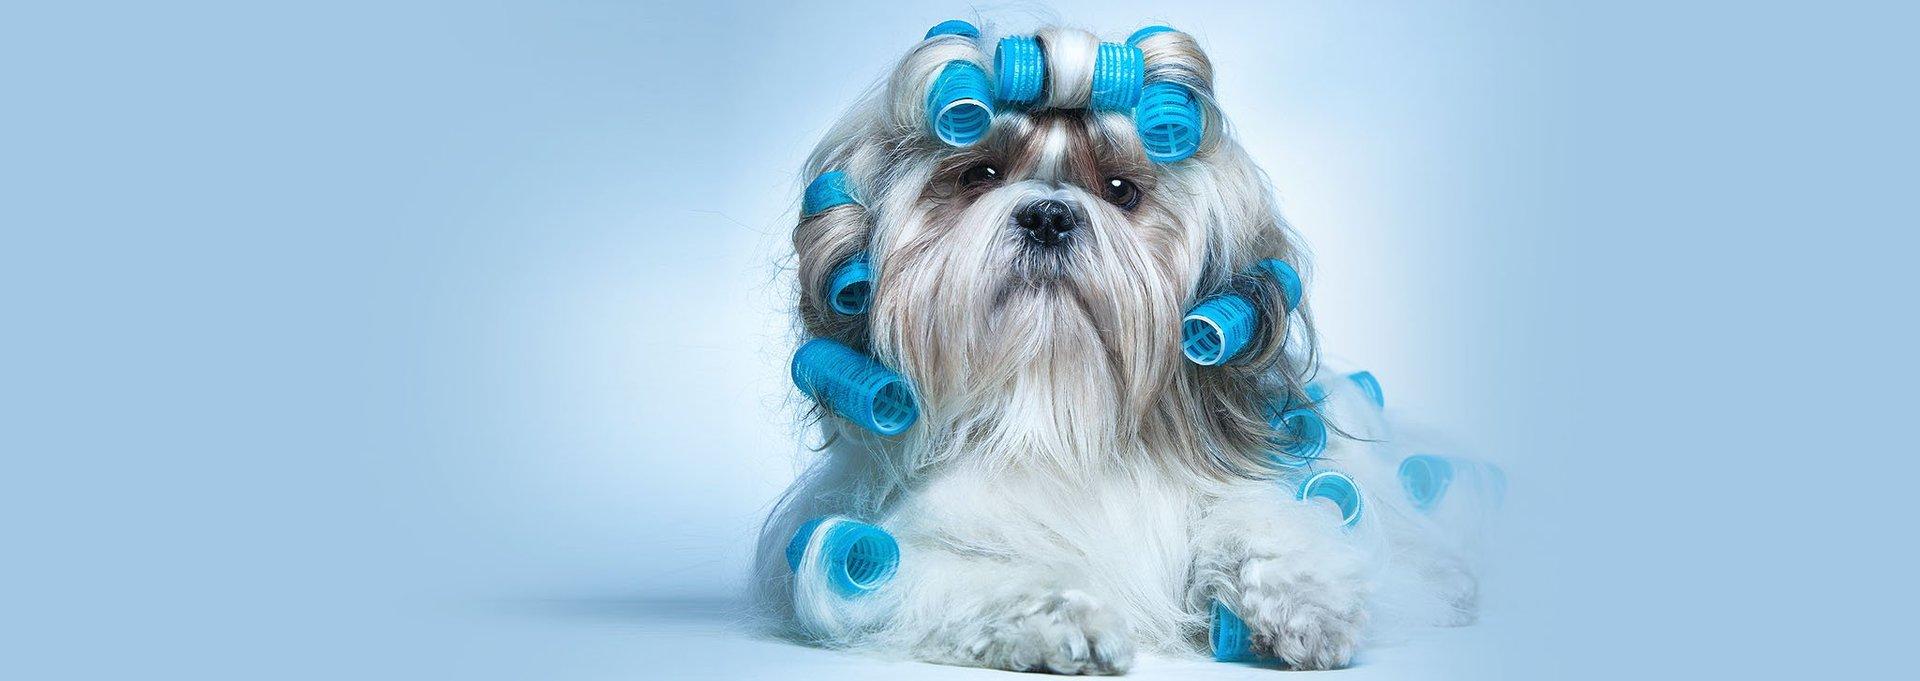 Grooming Stars - Mobile Dog Grooming Santa Monica